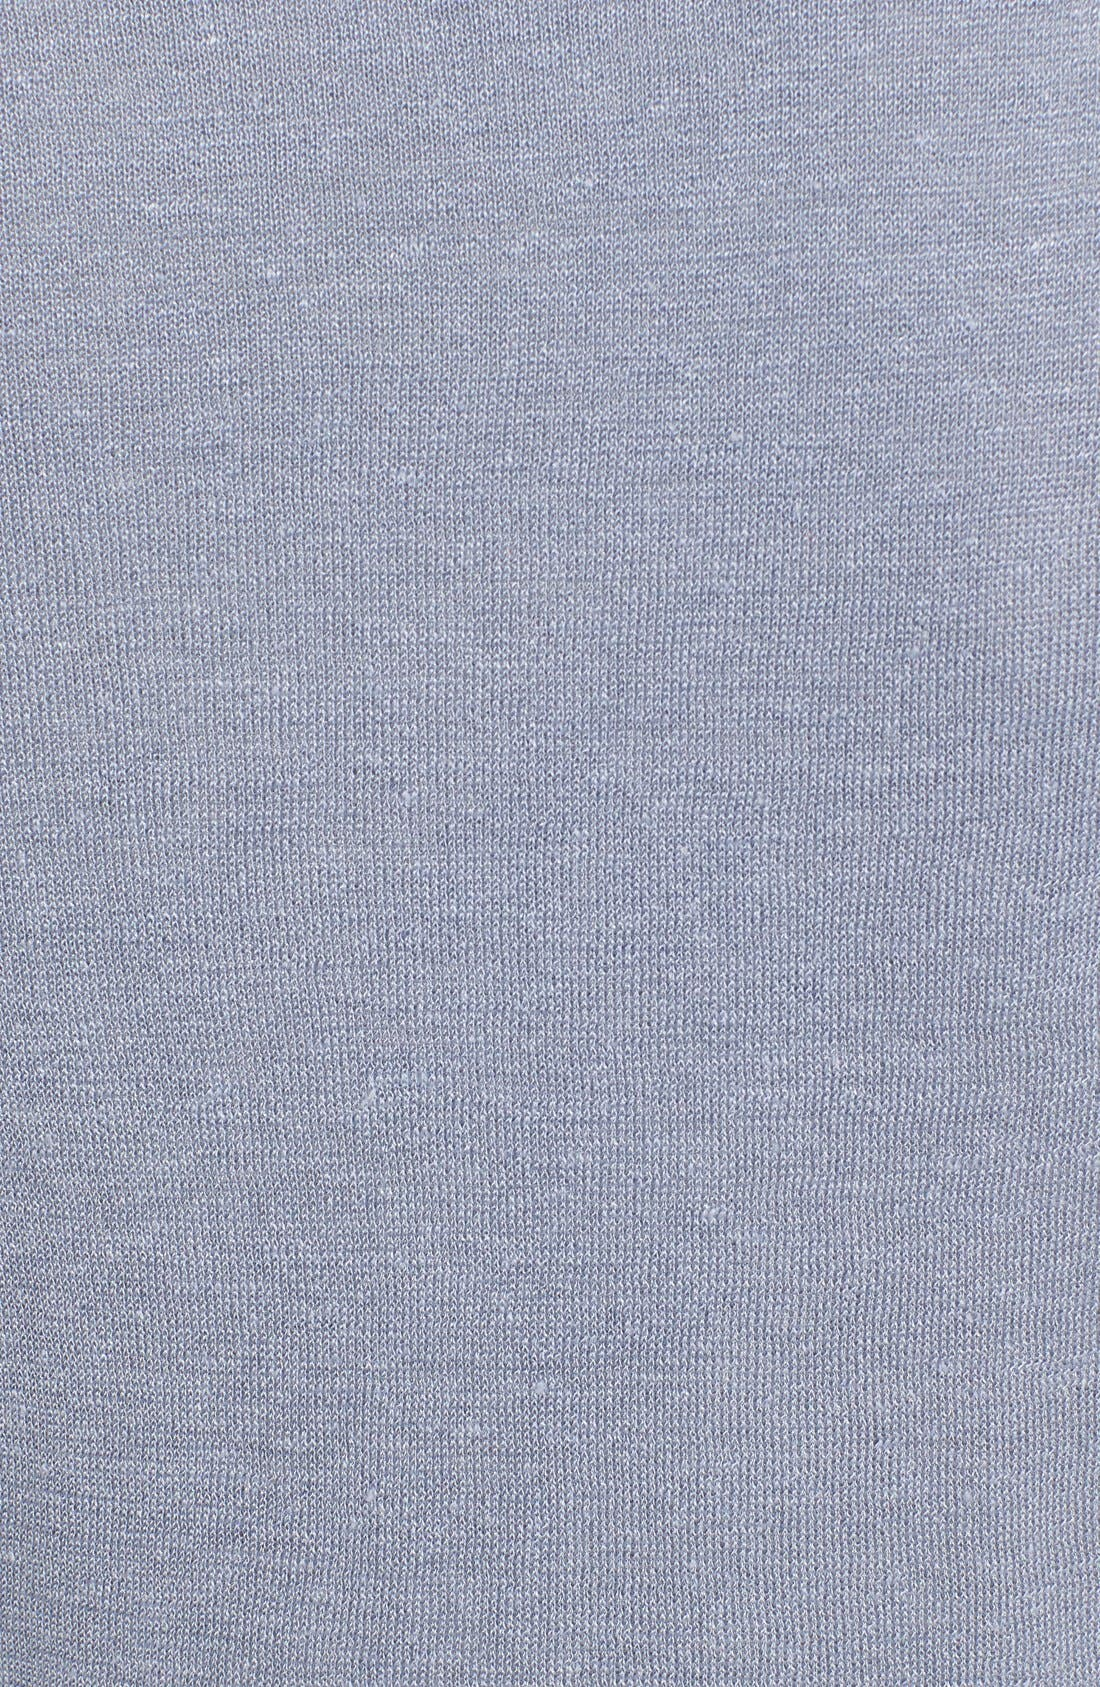 4-Way Convertible Lightweight Cardigan,                             Alternate thumbnail 399, color,